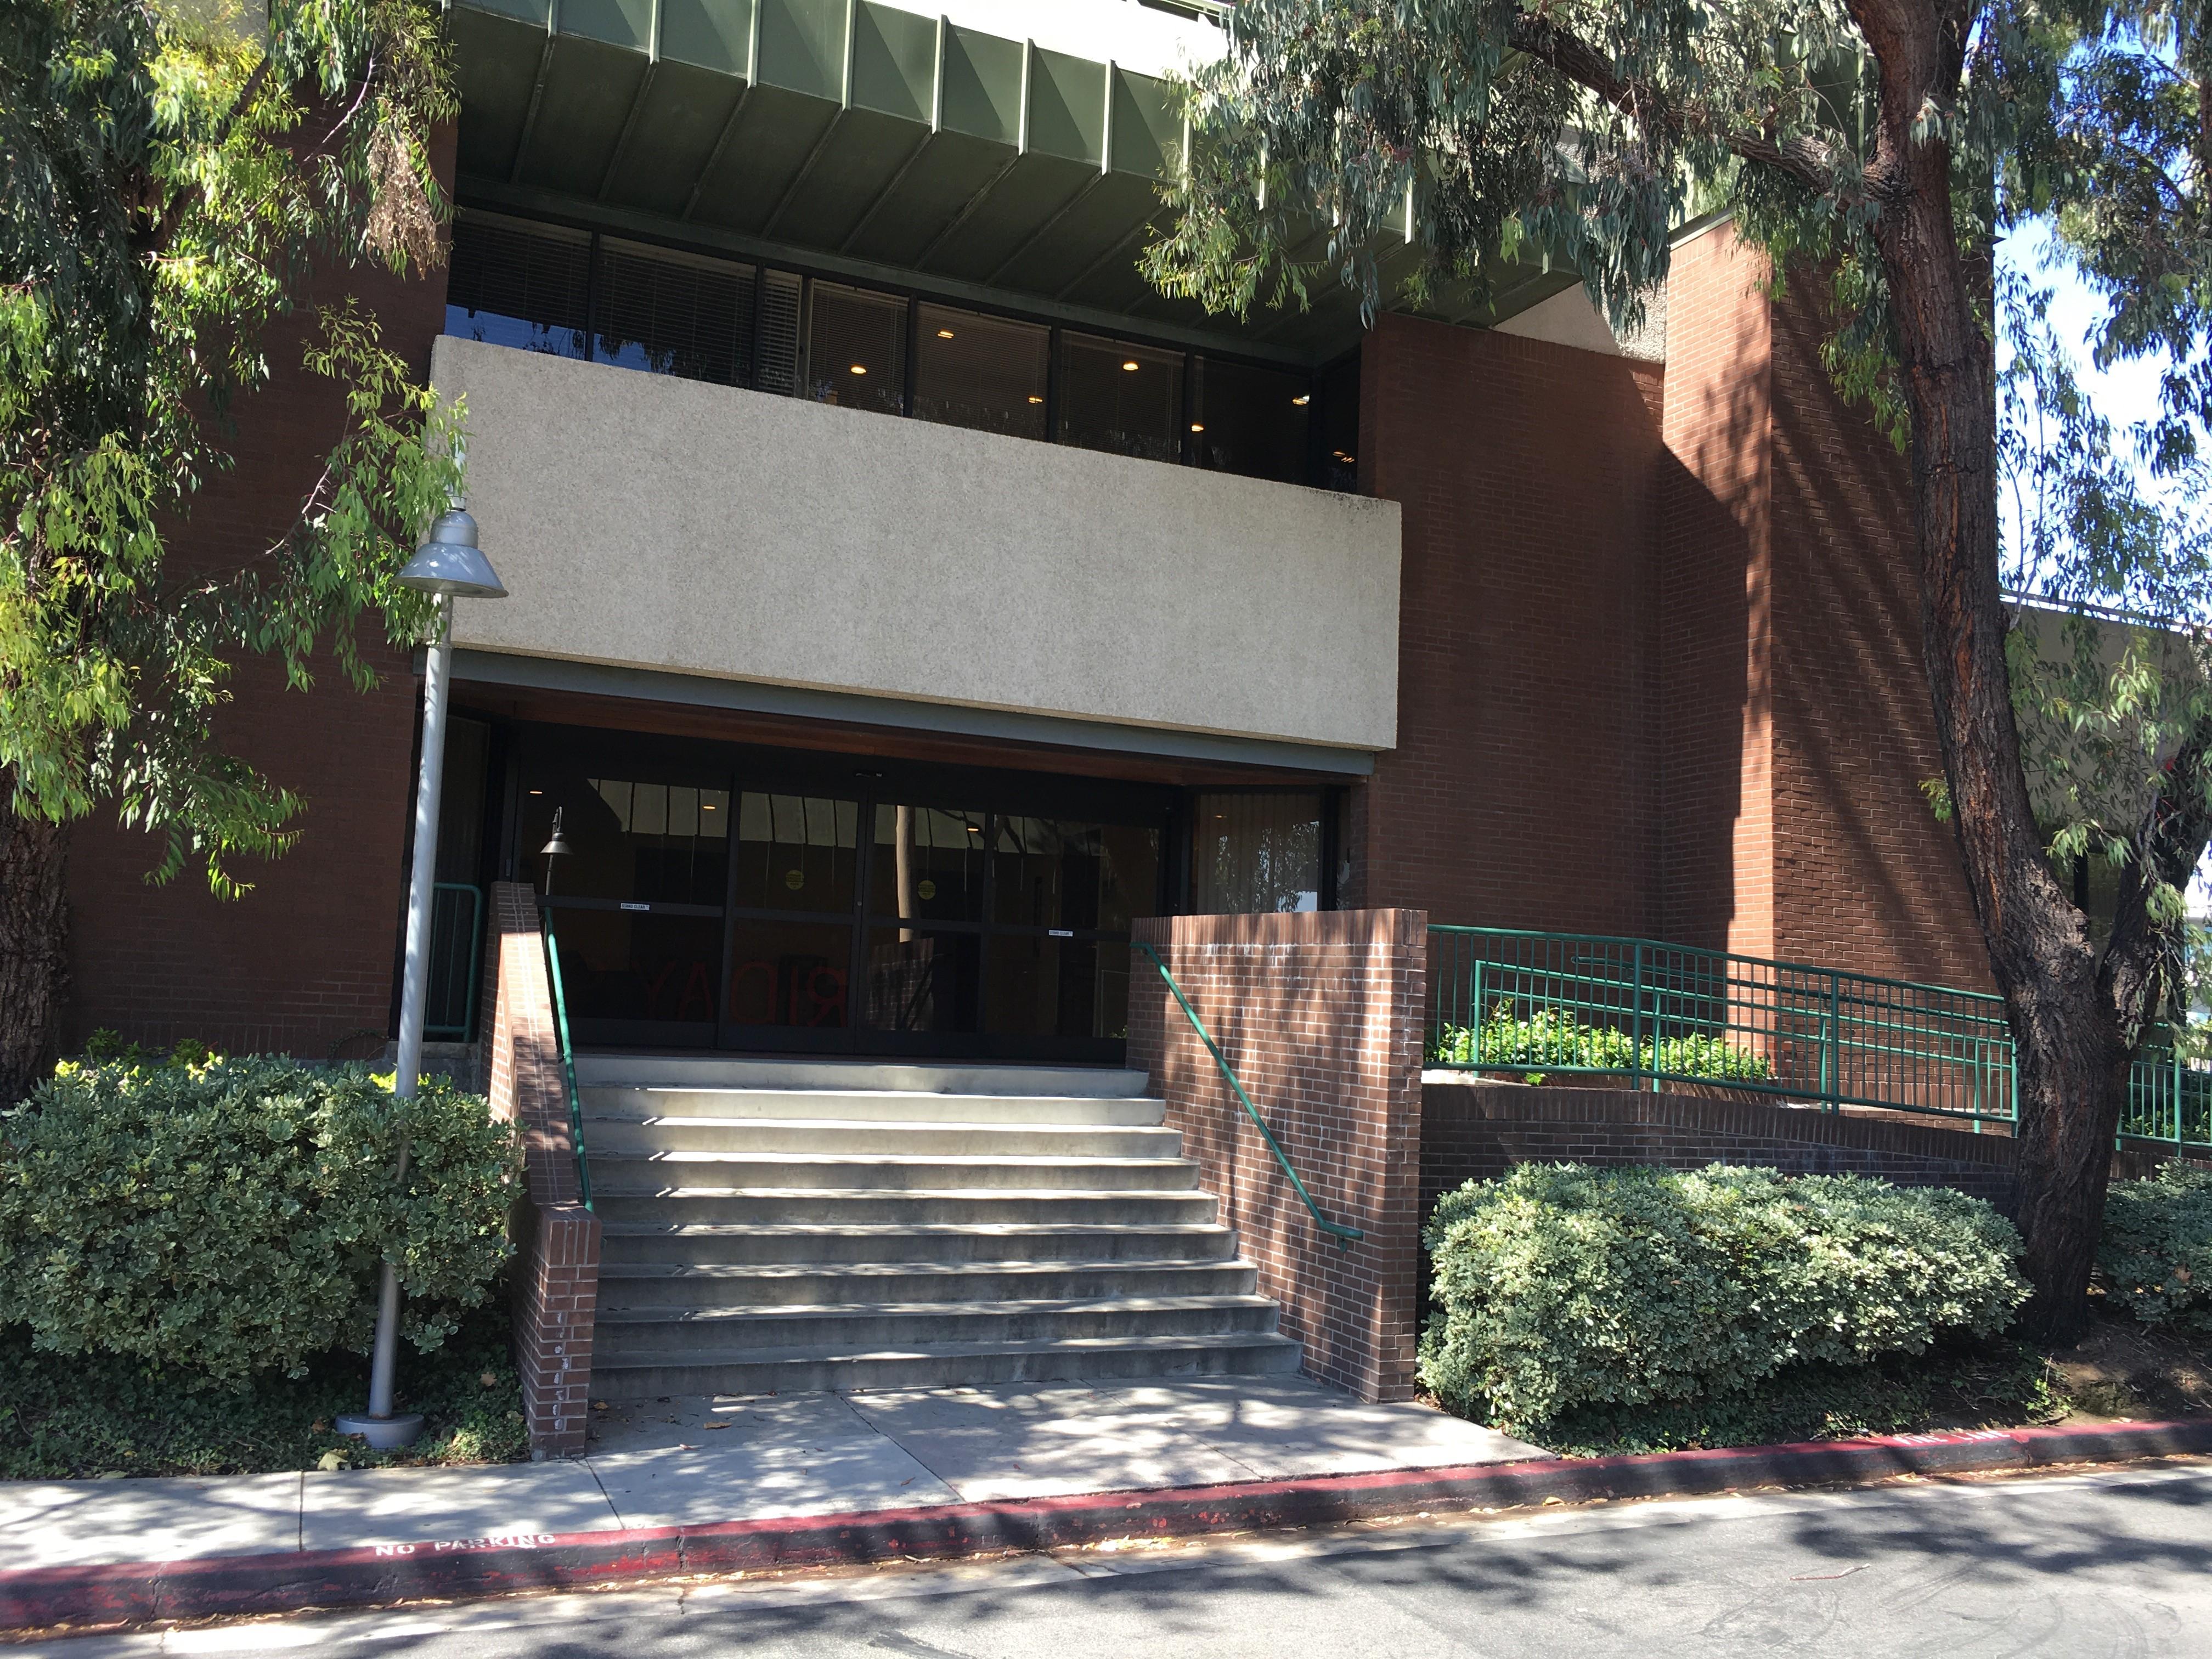 Torrance sleep center - Advanced Sleep Medicine Services - Entrance